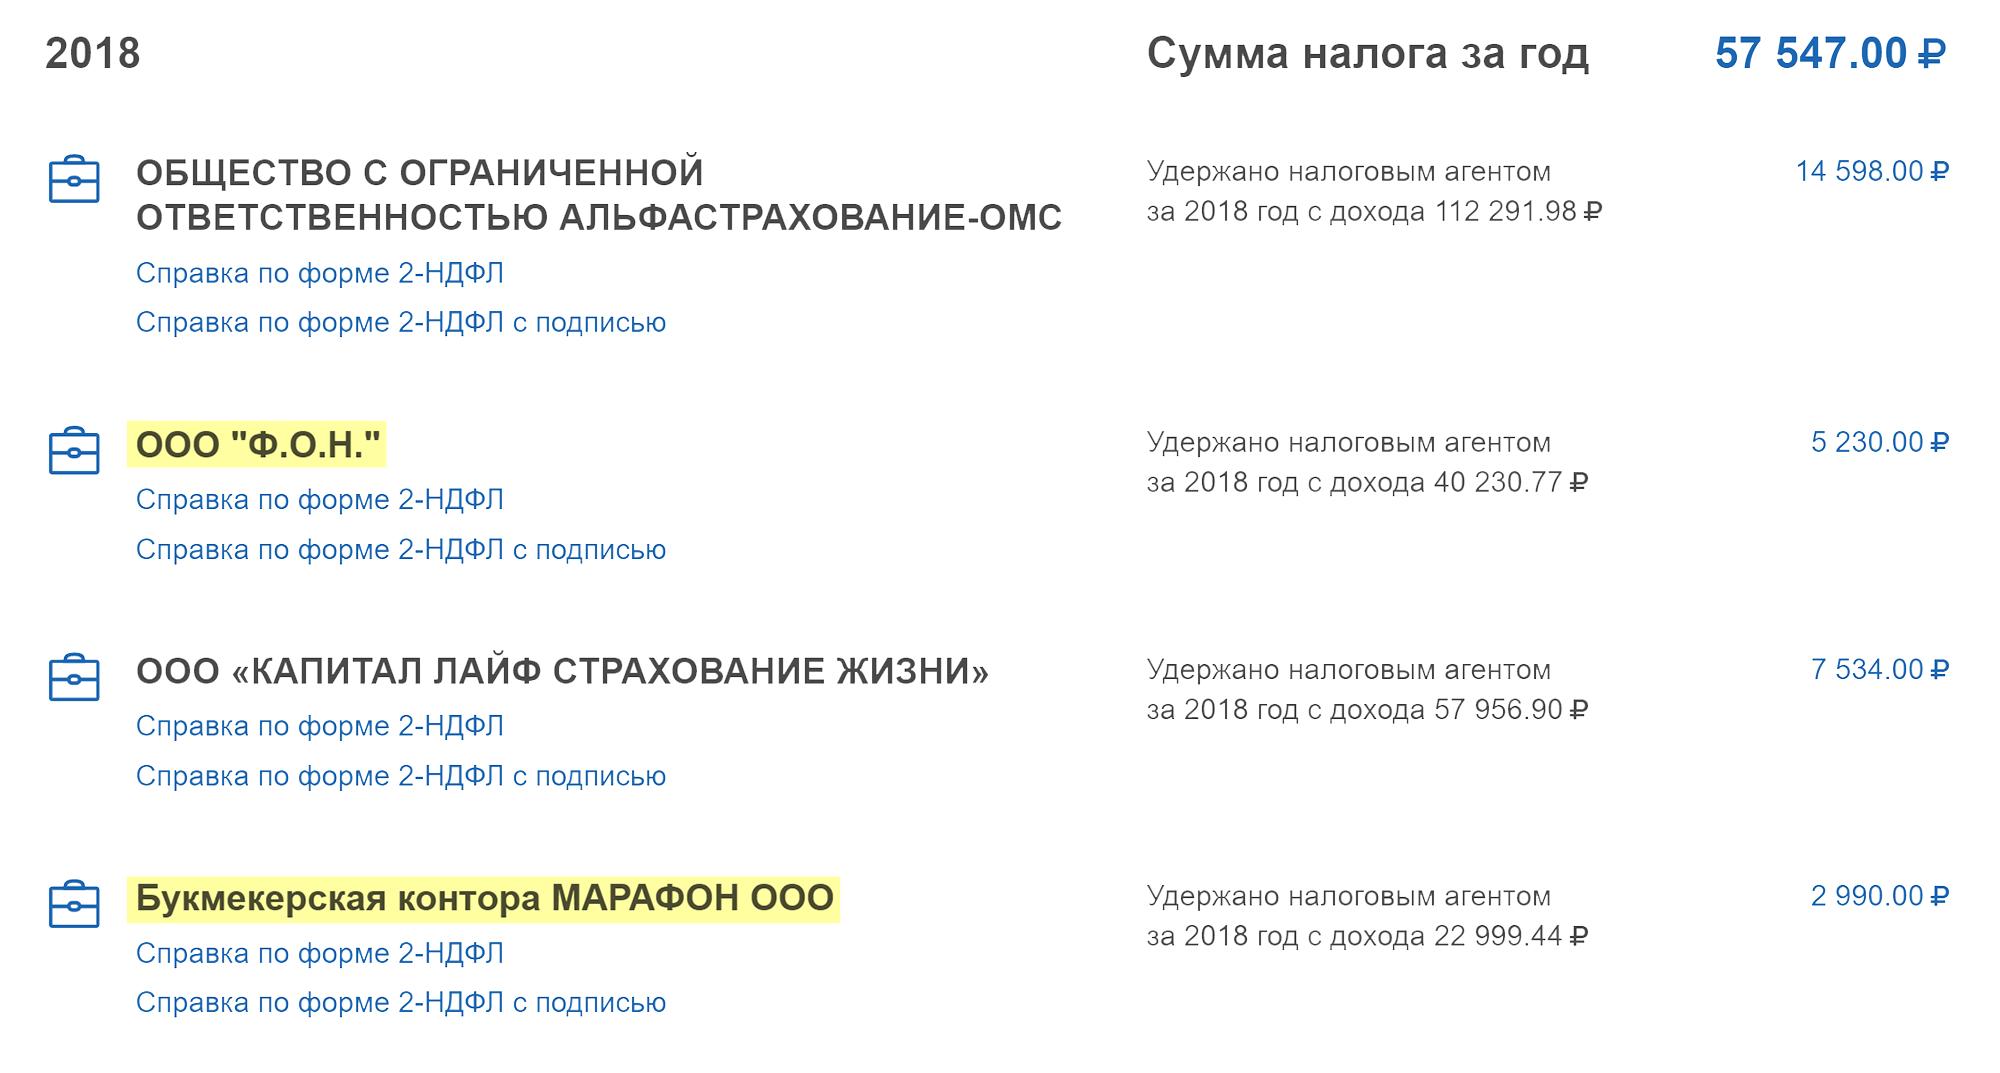 За 2018{amp}amp;nbsp;год я снимал больше 15 000{amp}lt;span class=ruble